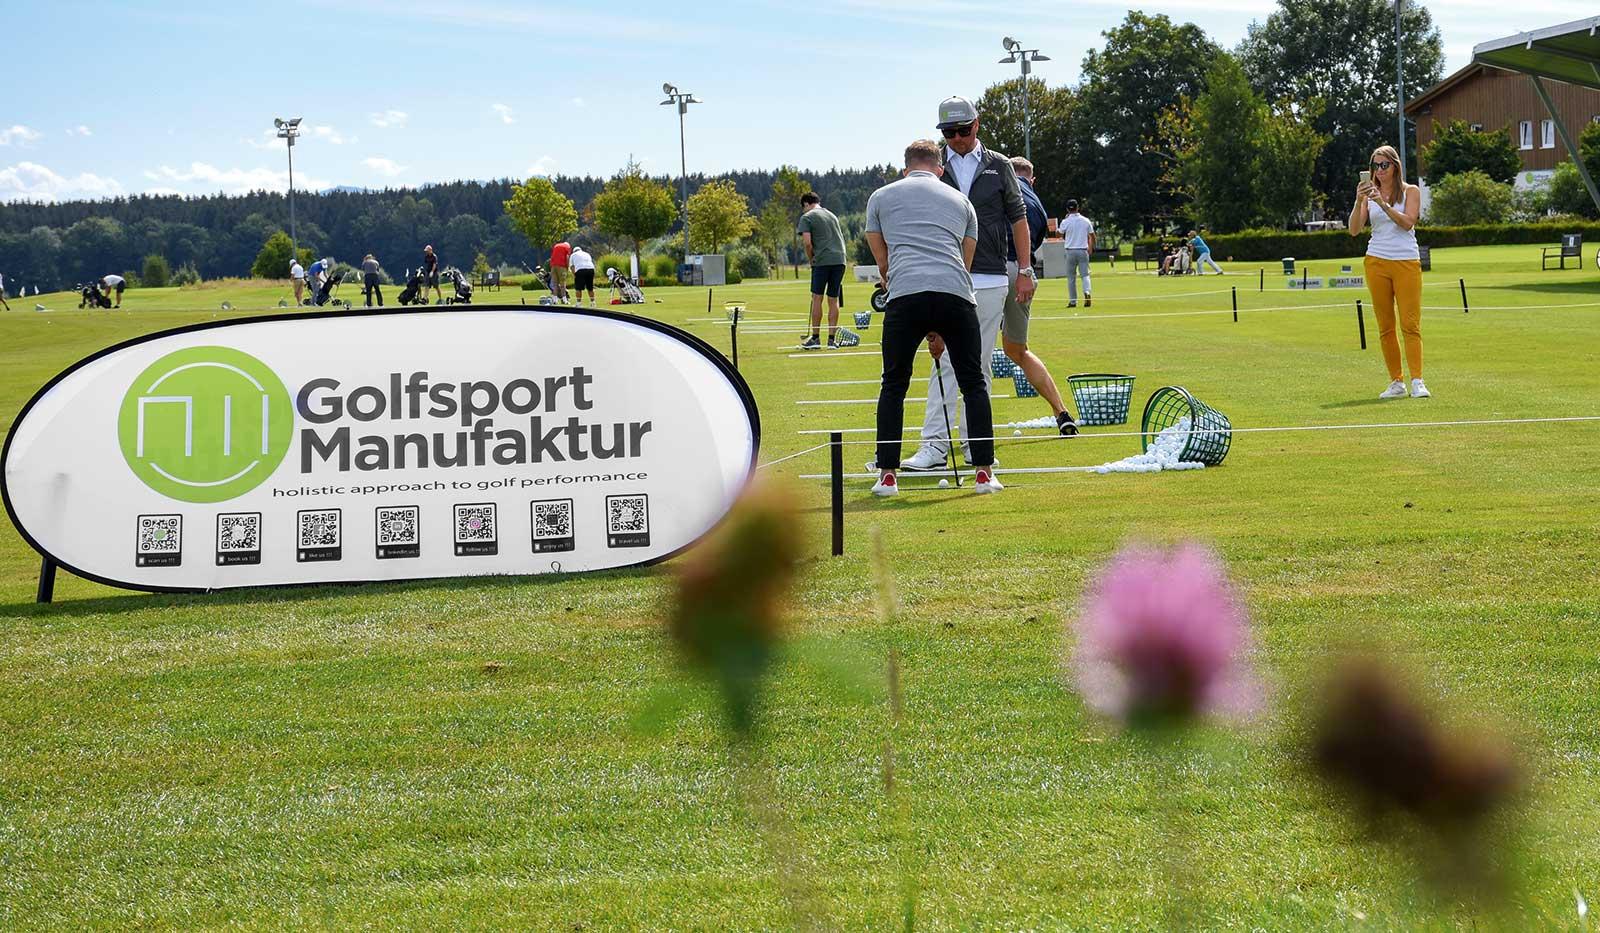 Golfsport Manufaktur